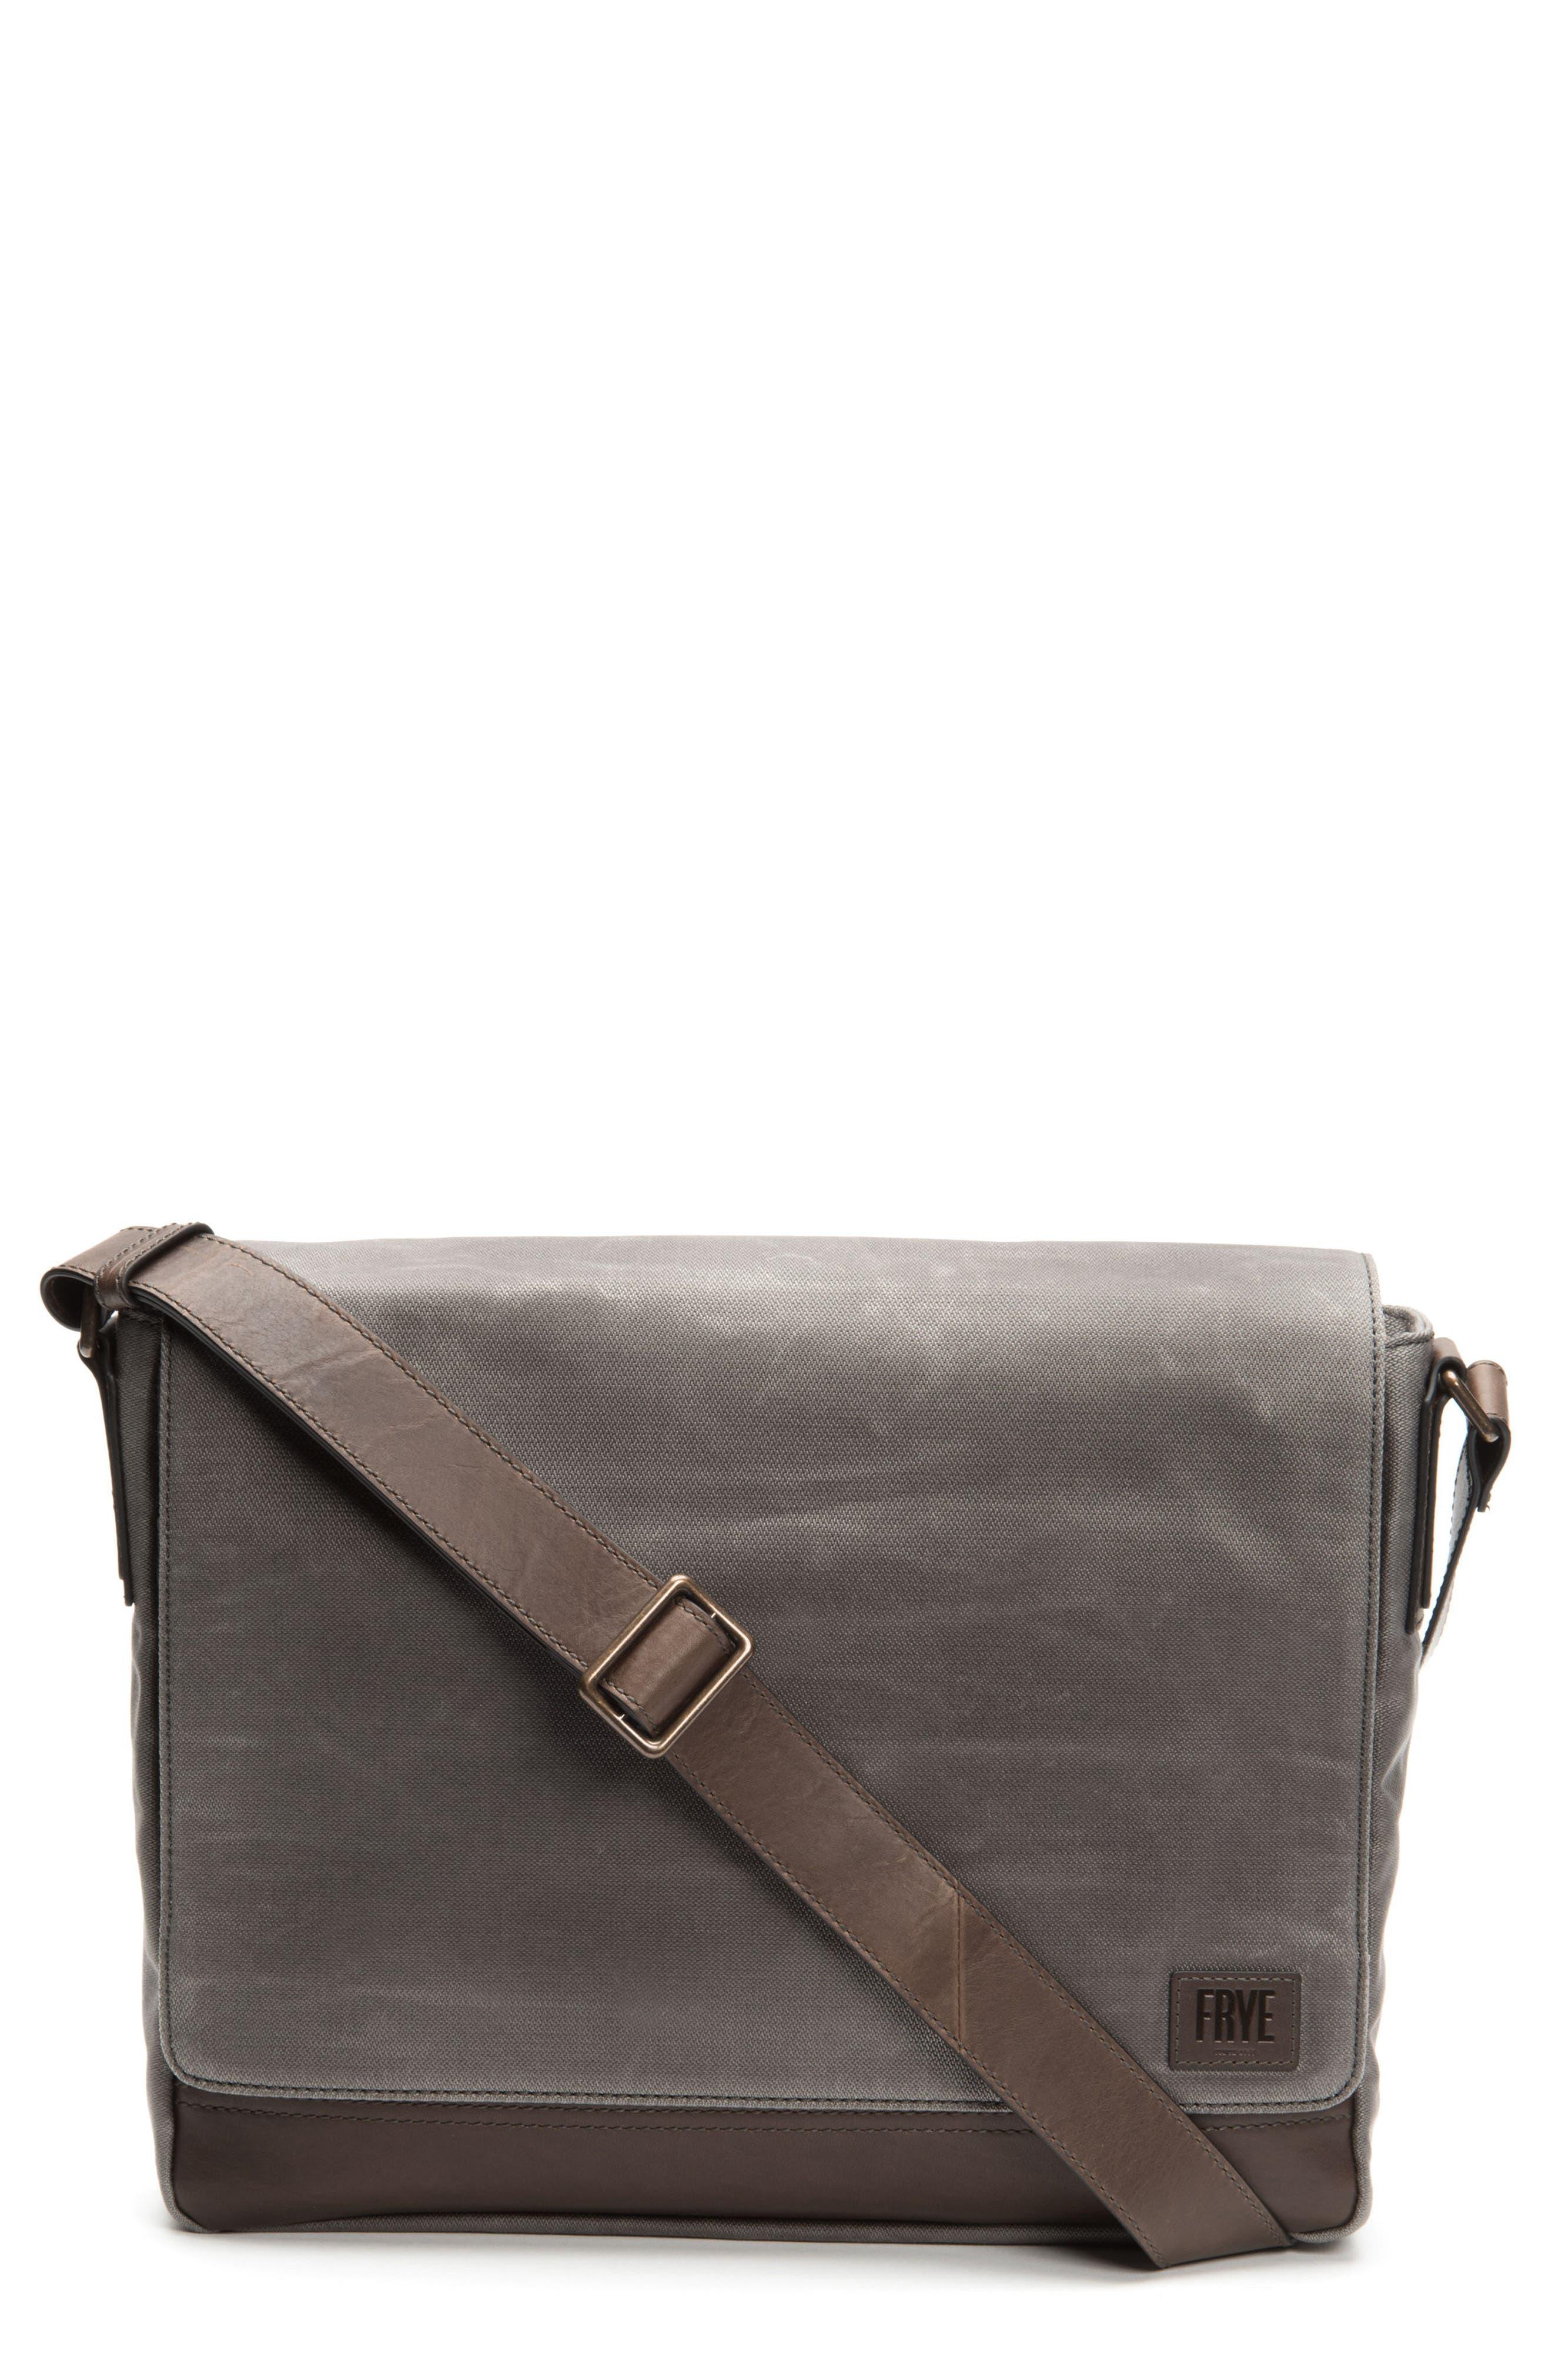 Frey Carter Messenger Bag